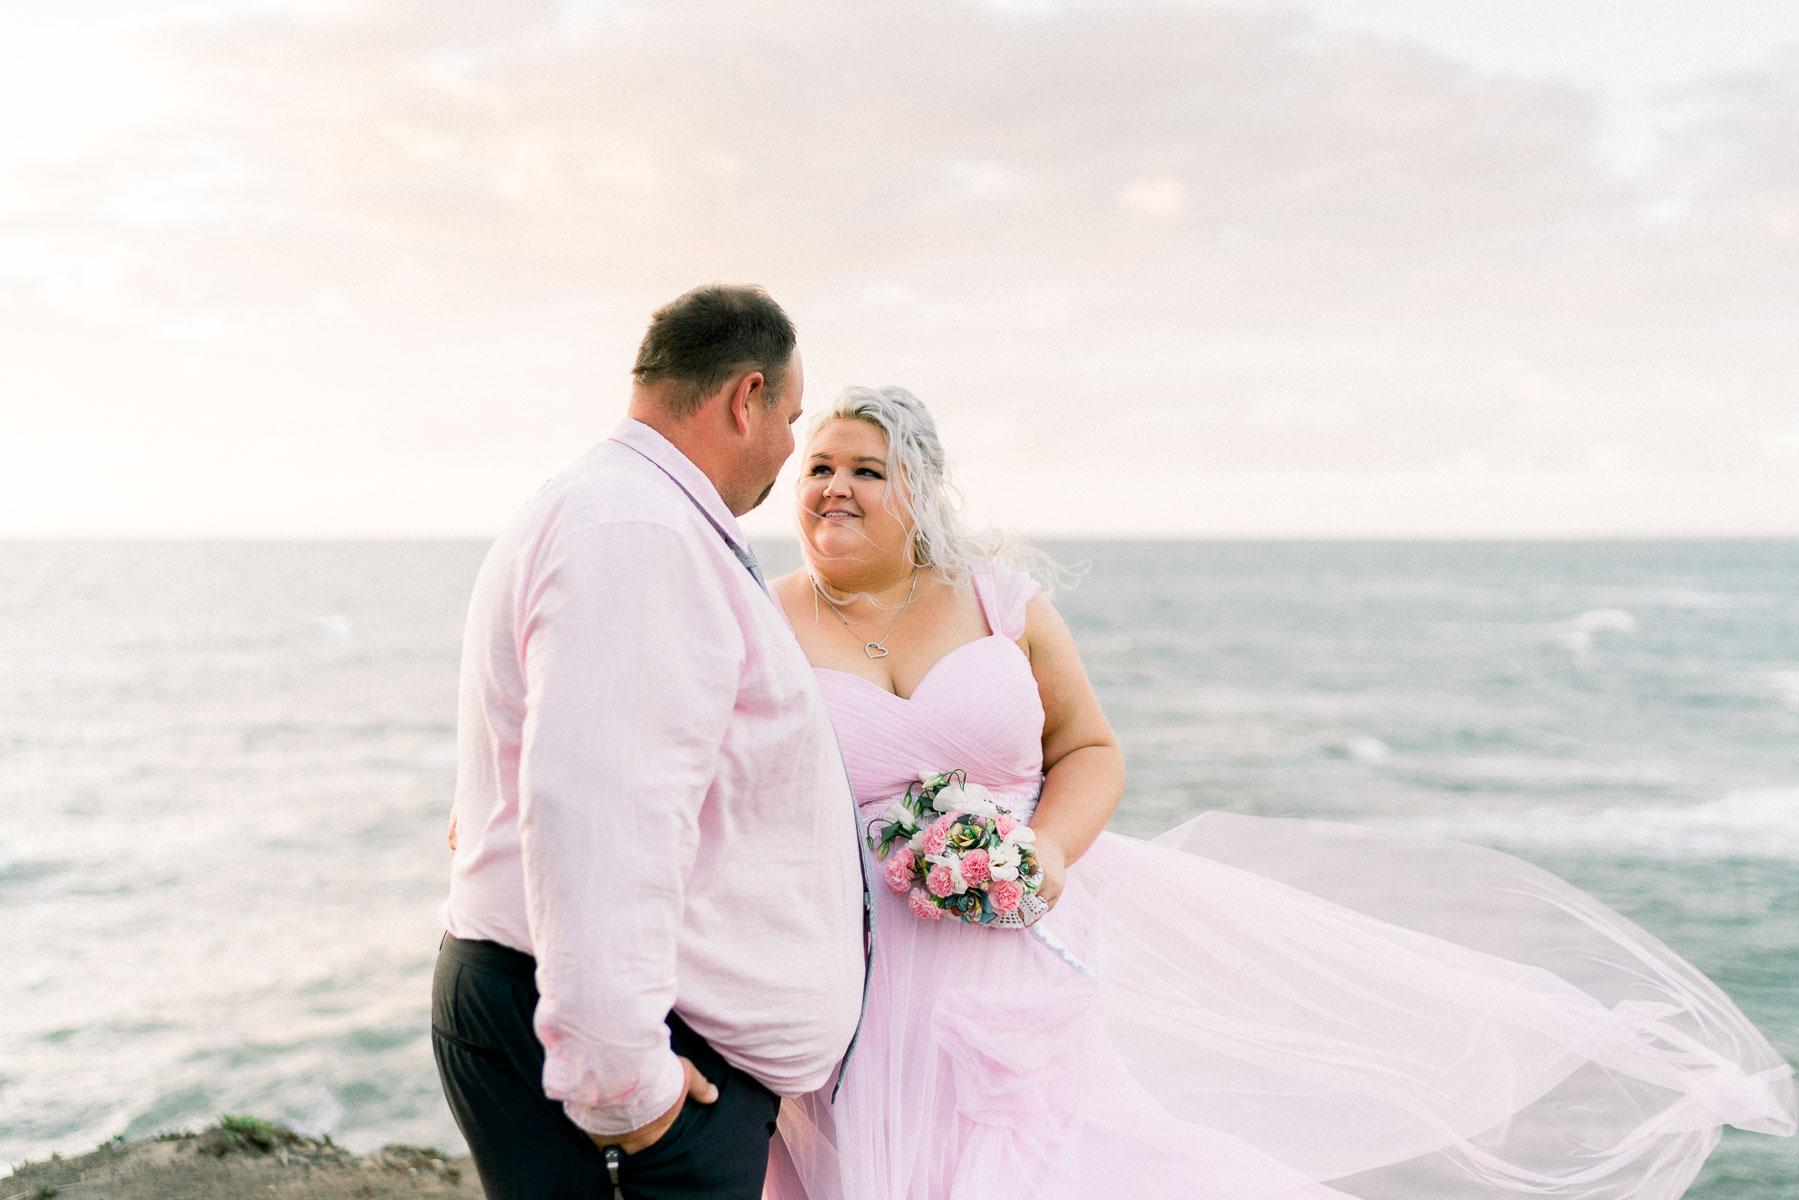 mt-eliza-mornington-peninsula-backyard-wedding-heart+soul-weddings-allison-matt-04072.jpg